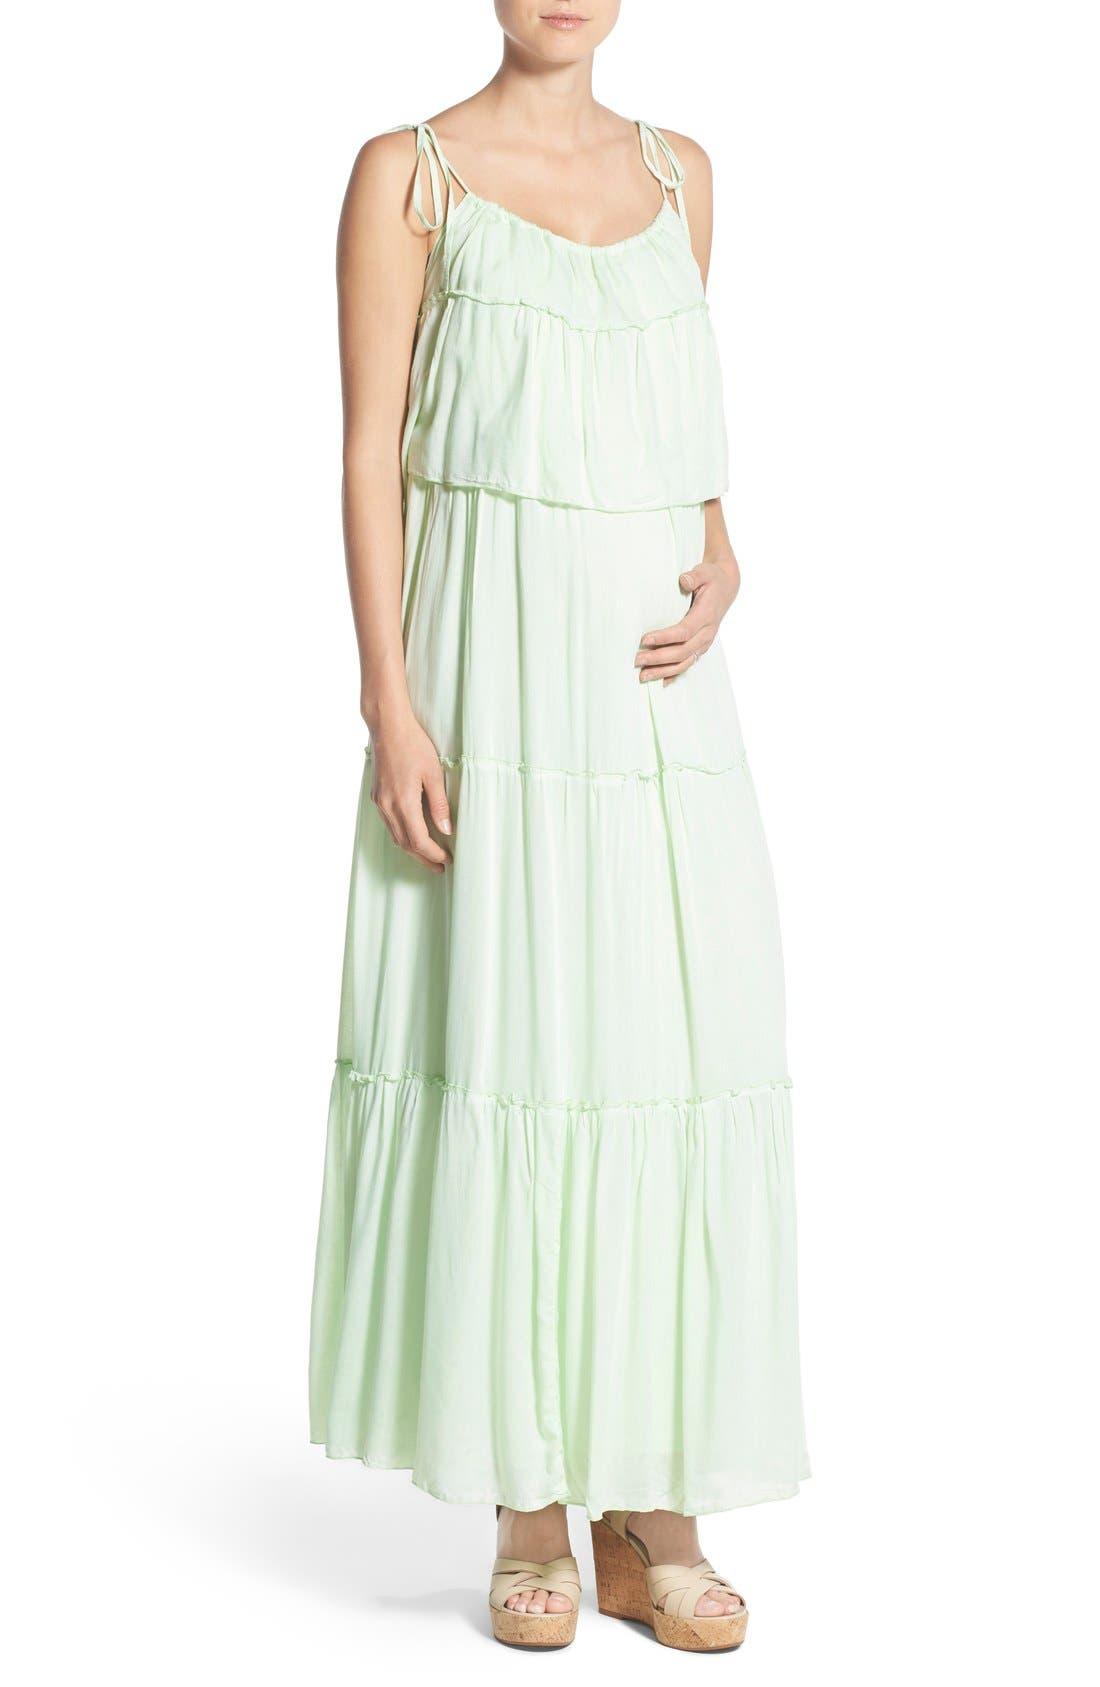 Fillyboo 'Songbird' Popover Maternity/Nursing Maxi Dress